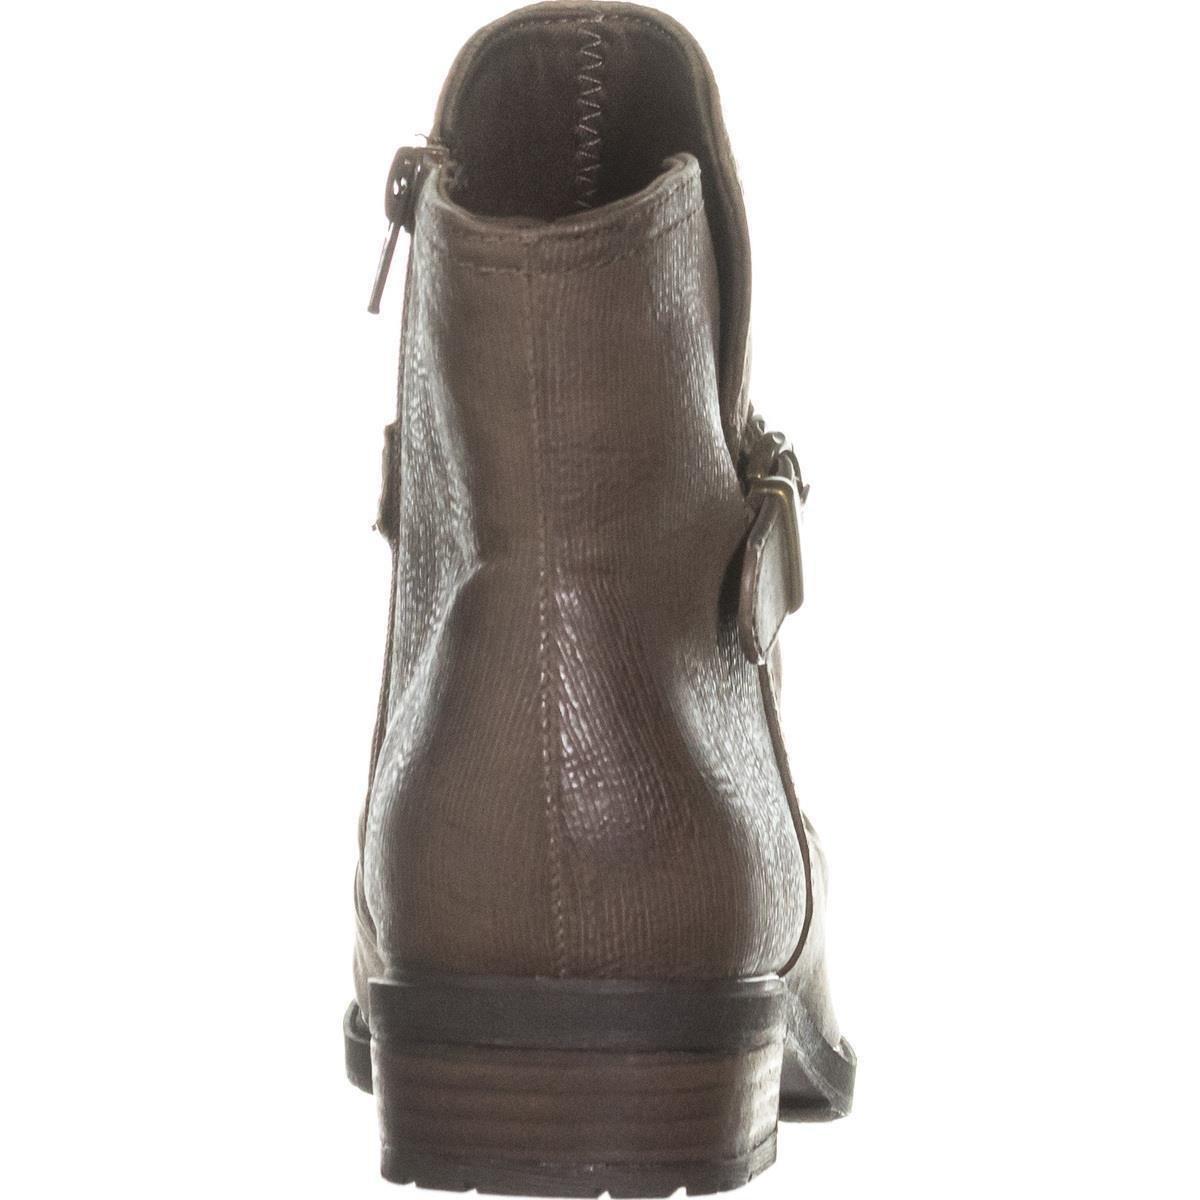 Bare Traps Frauen ysidora Geschlossener Zeh Fashion Fashion Fashion Stiefel c5e3cd